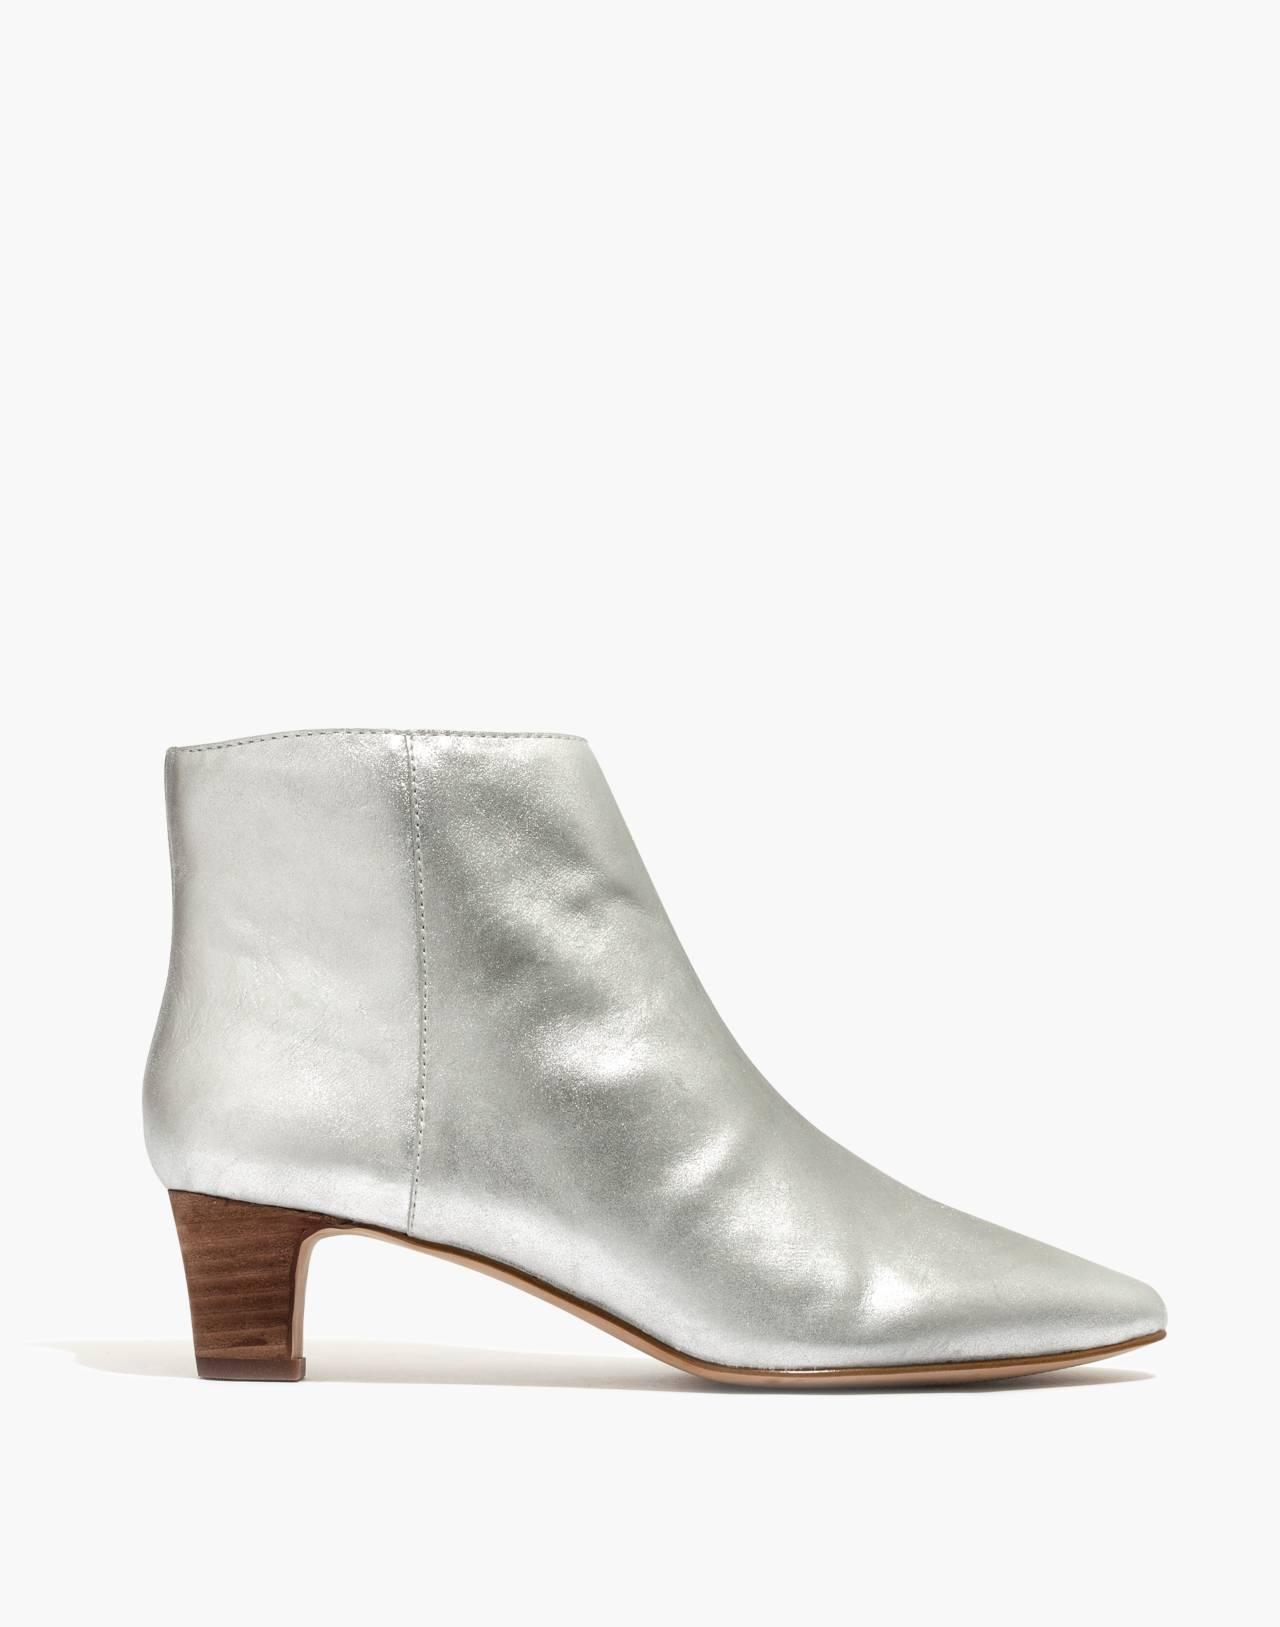 The Portia Boot in Metallic in silver image 3